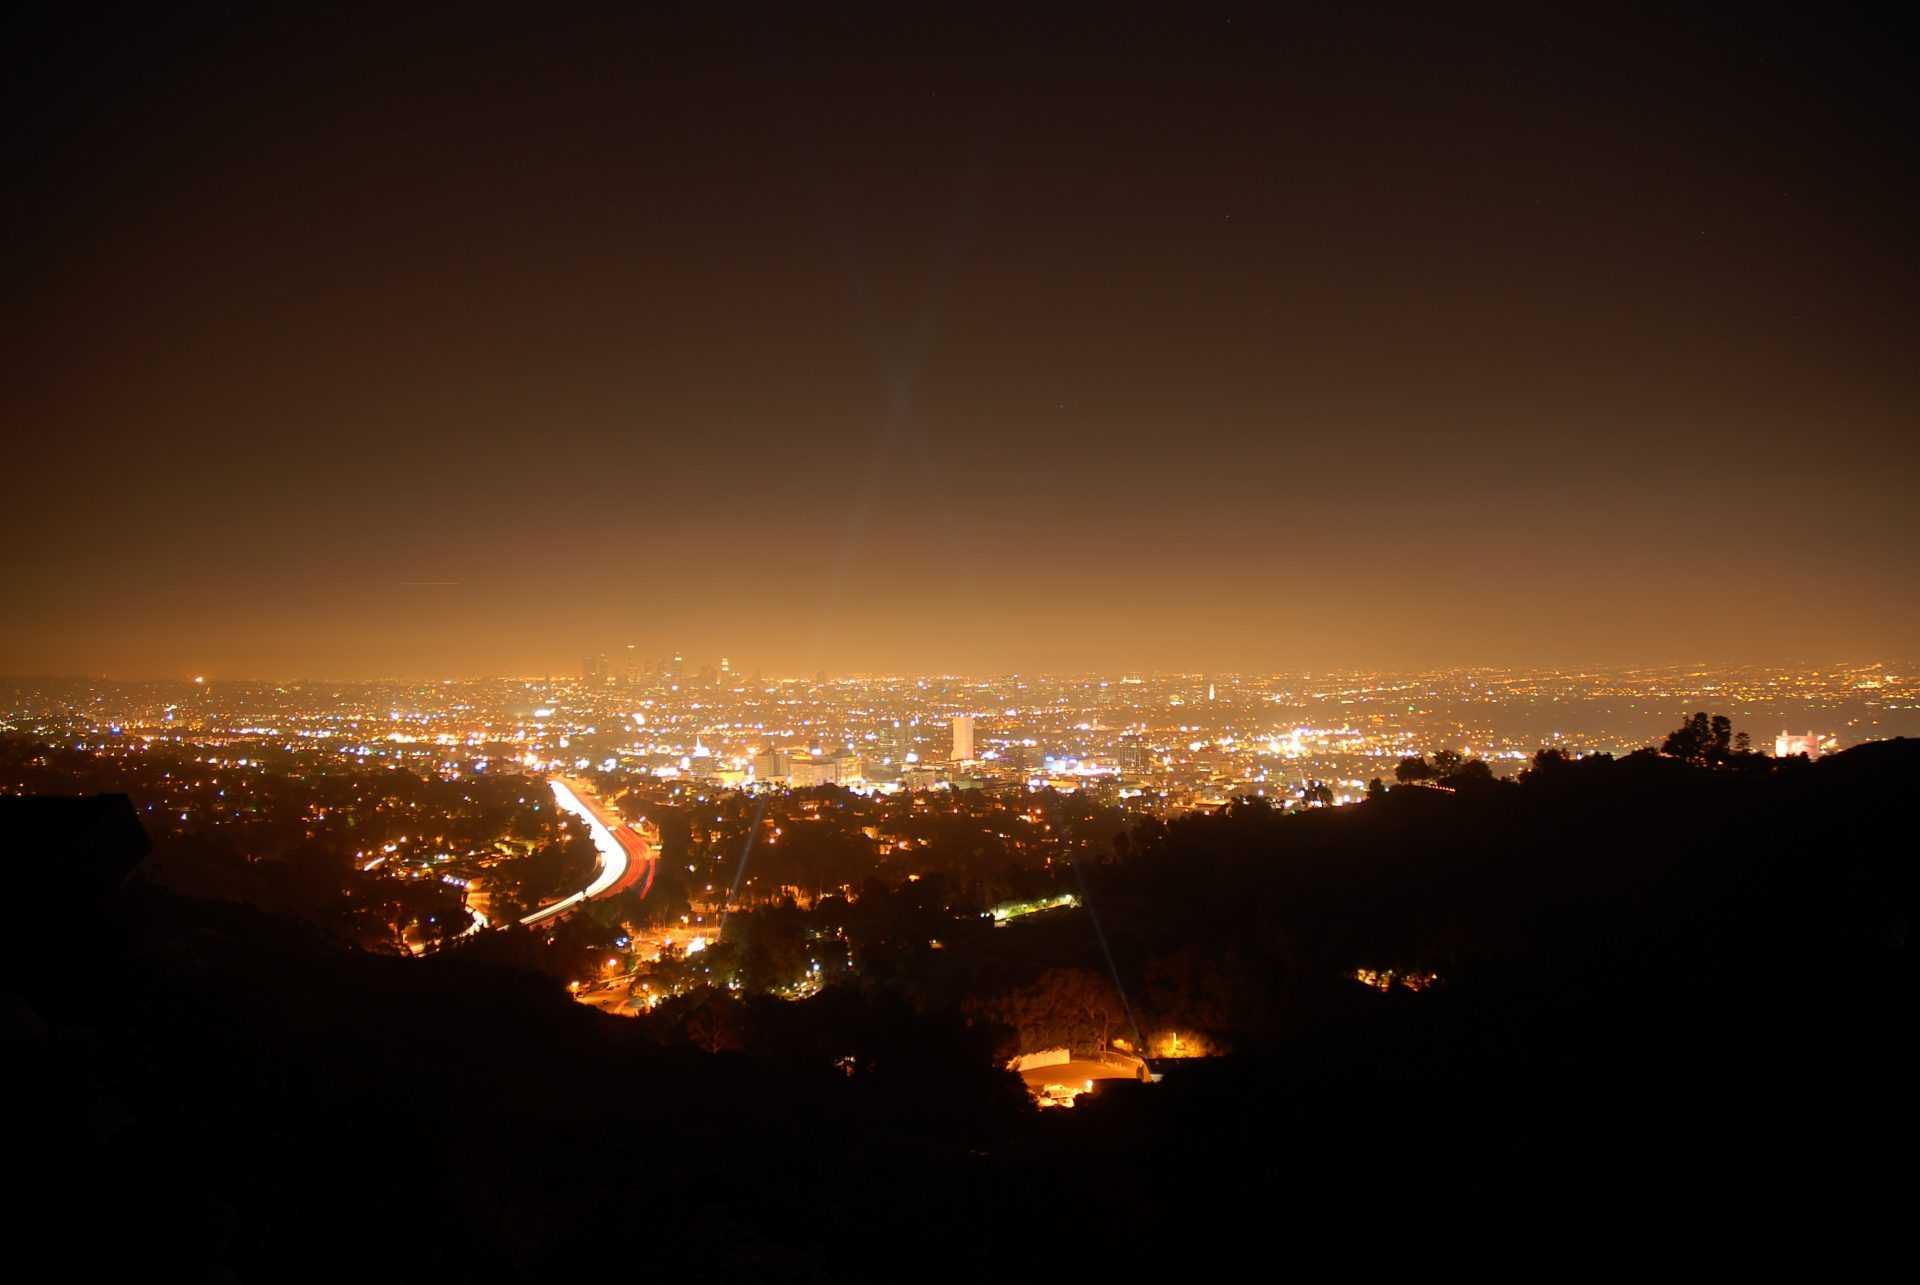 Влияние светового загрязнения на человека